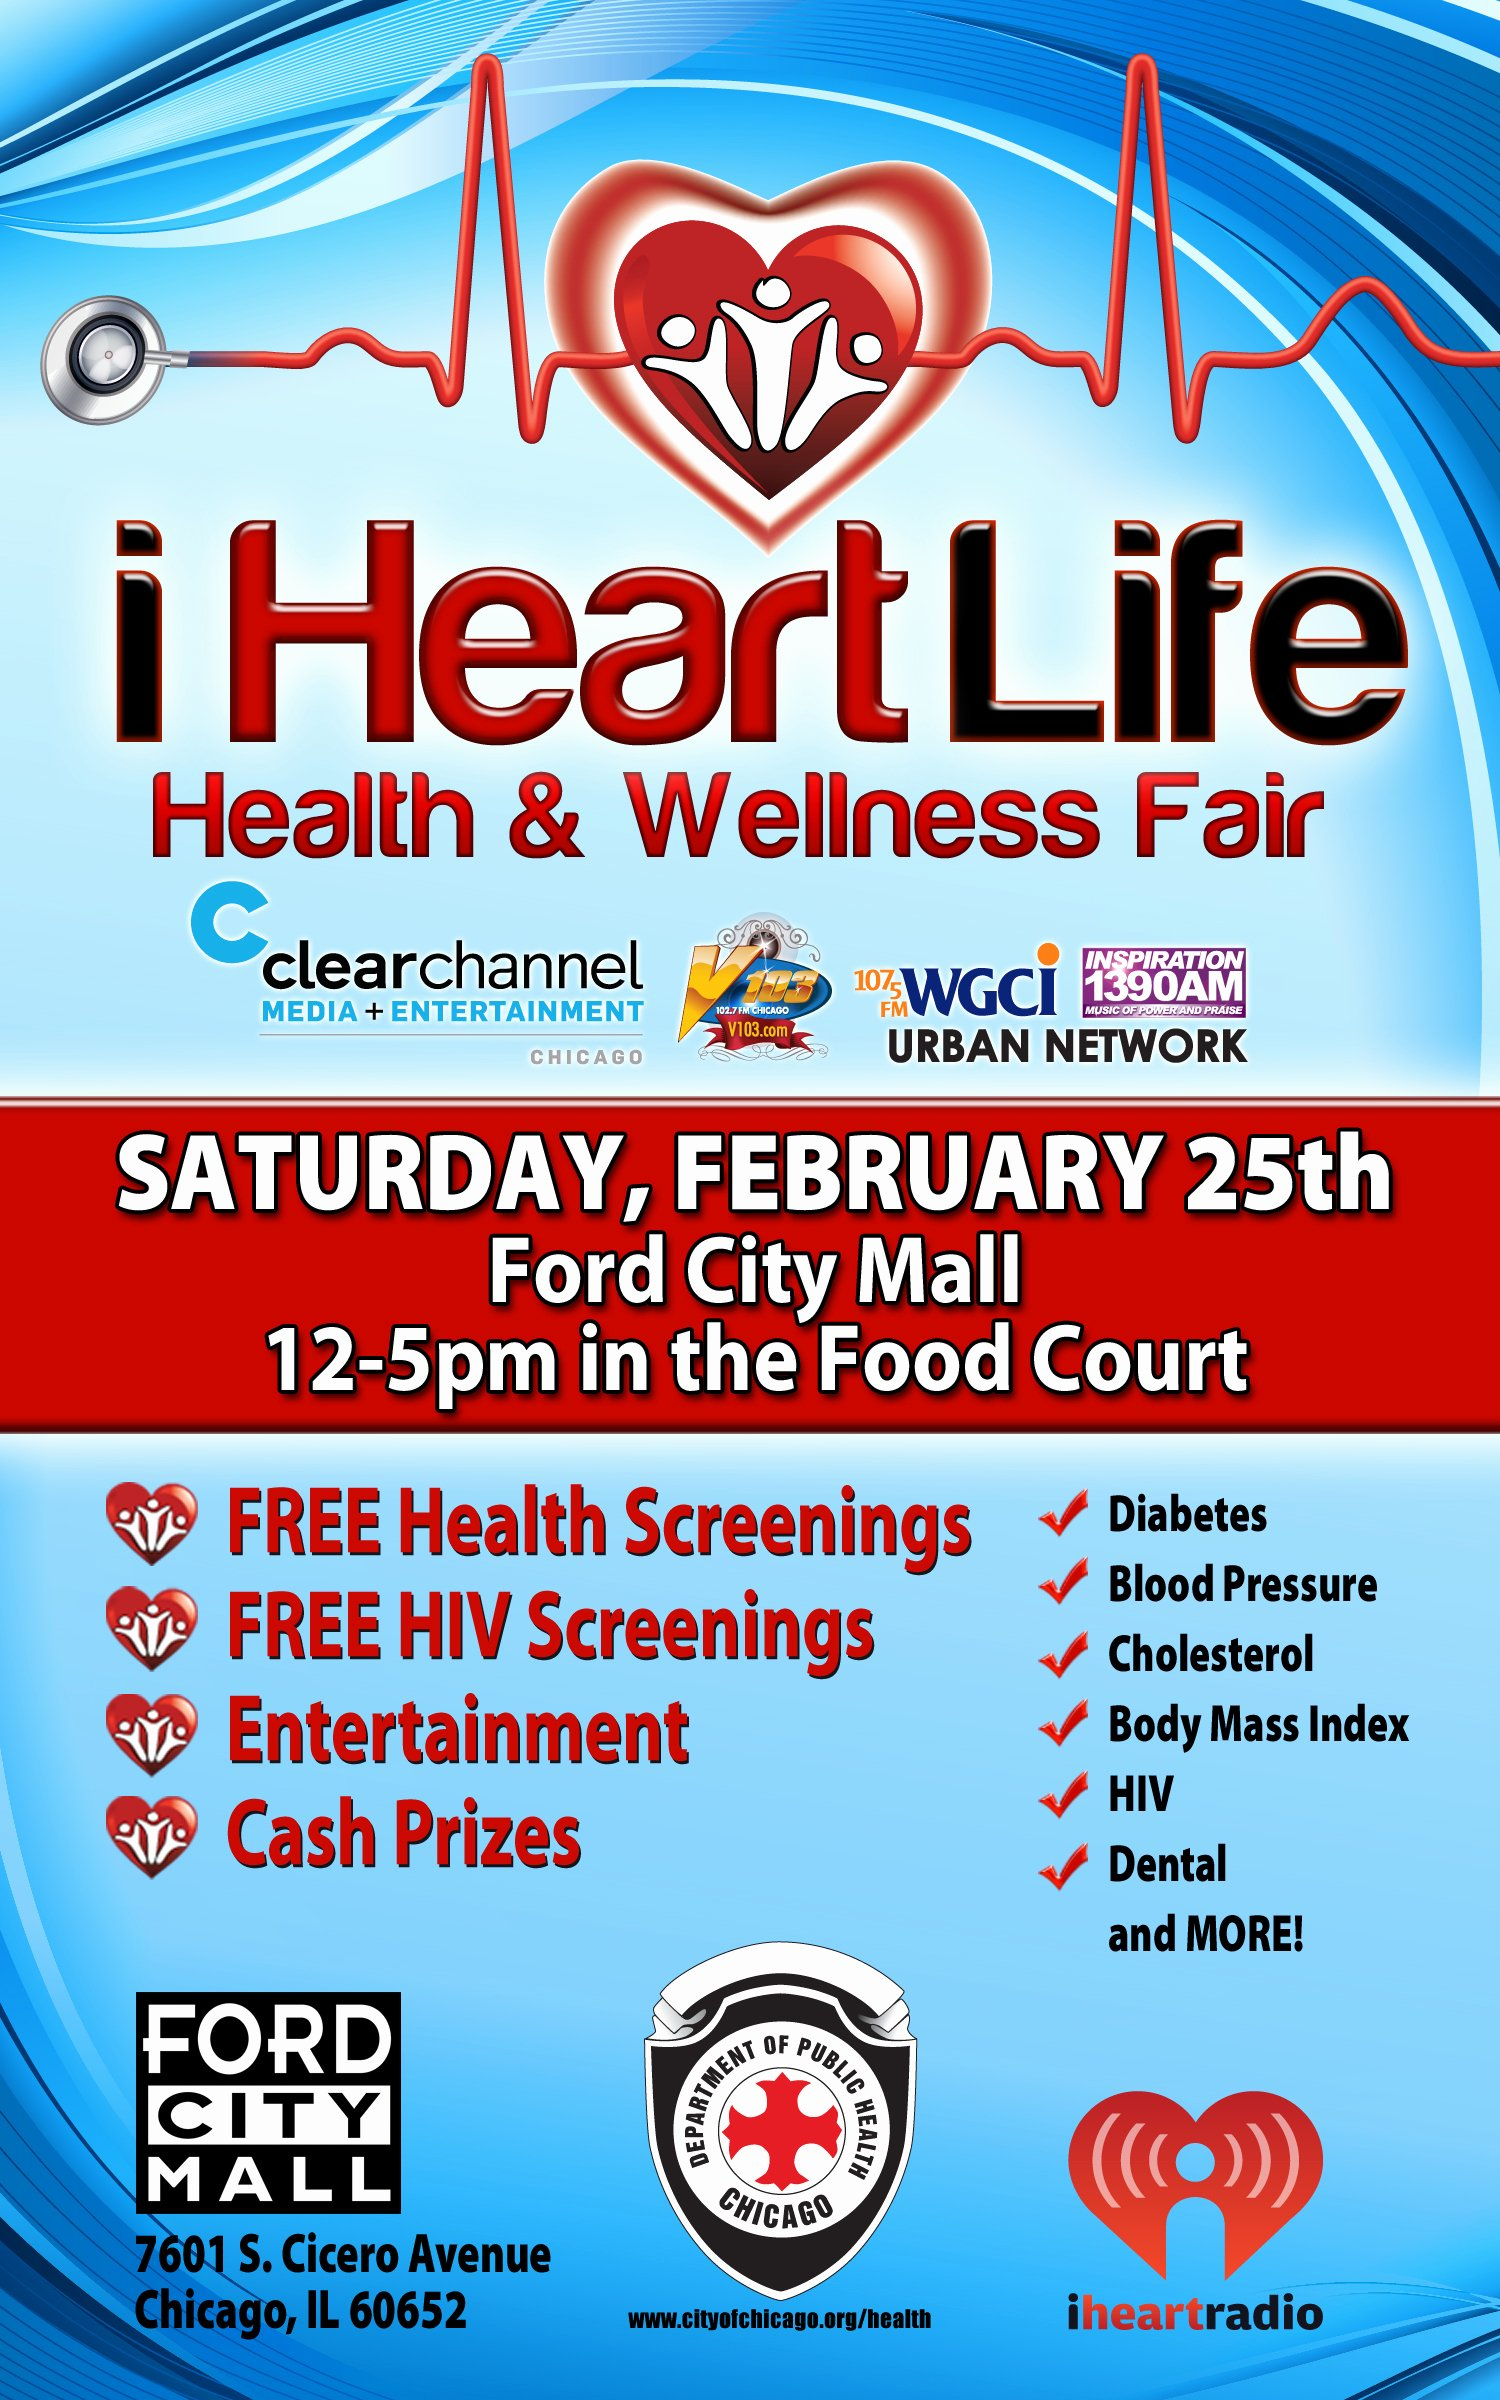 Health Fair Flyer Template Fresh City Of Chicago Wellness Fair This Saturday